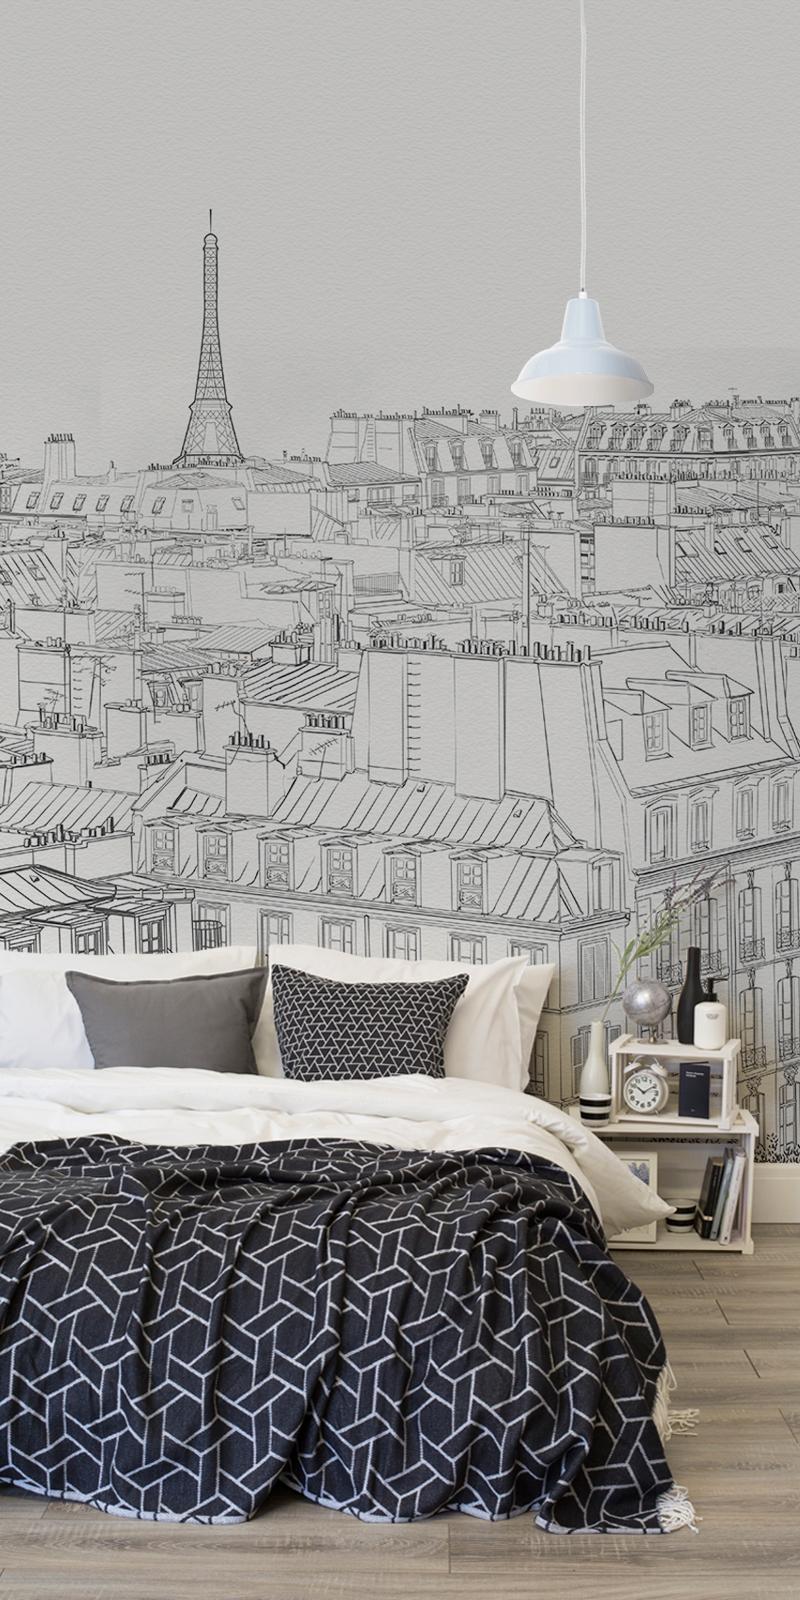 NRS City Wallpaper Paris Illustrated Bedroom